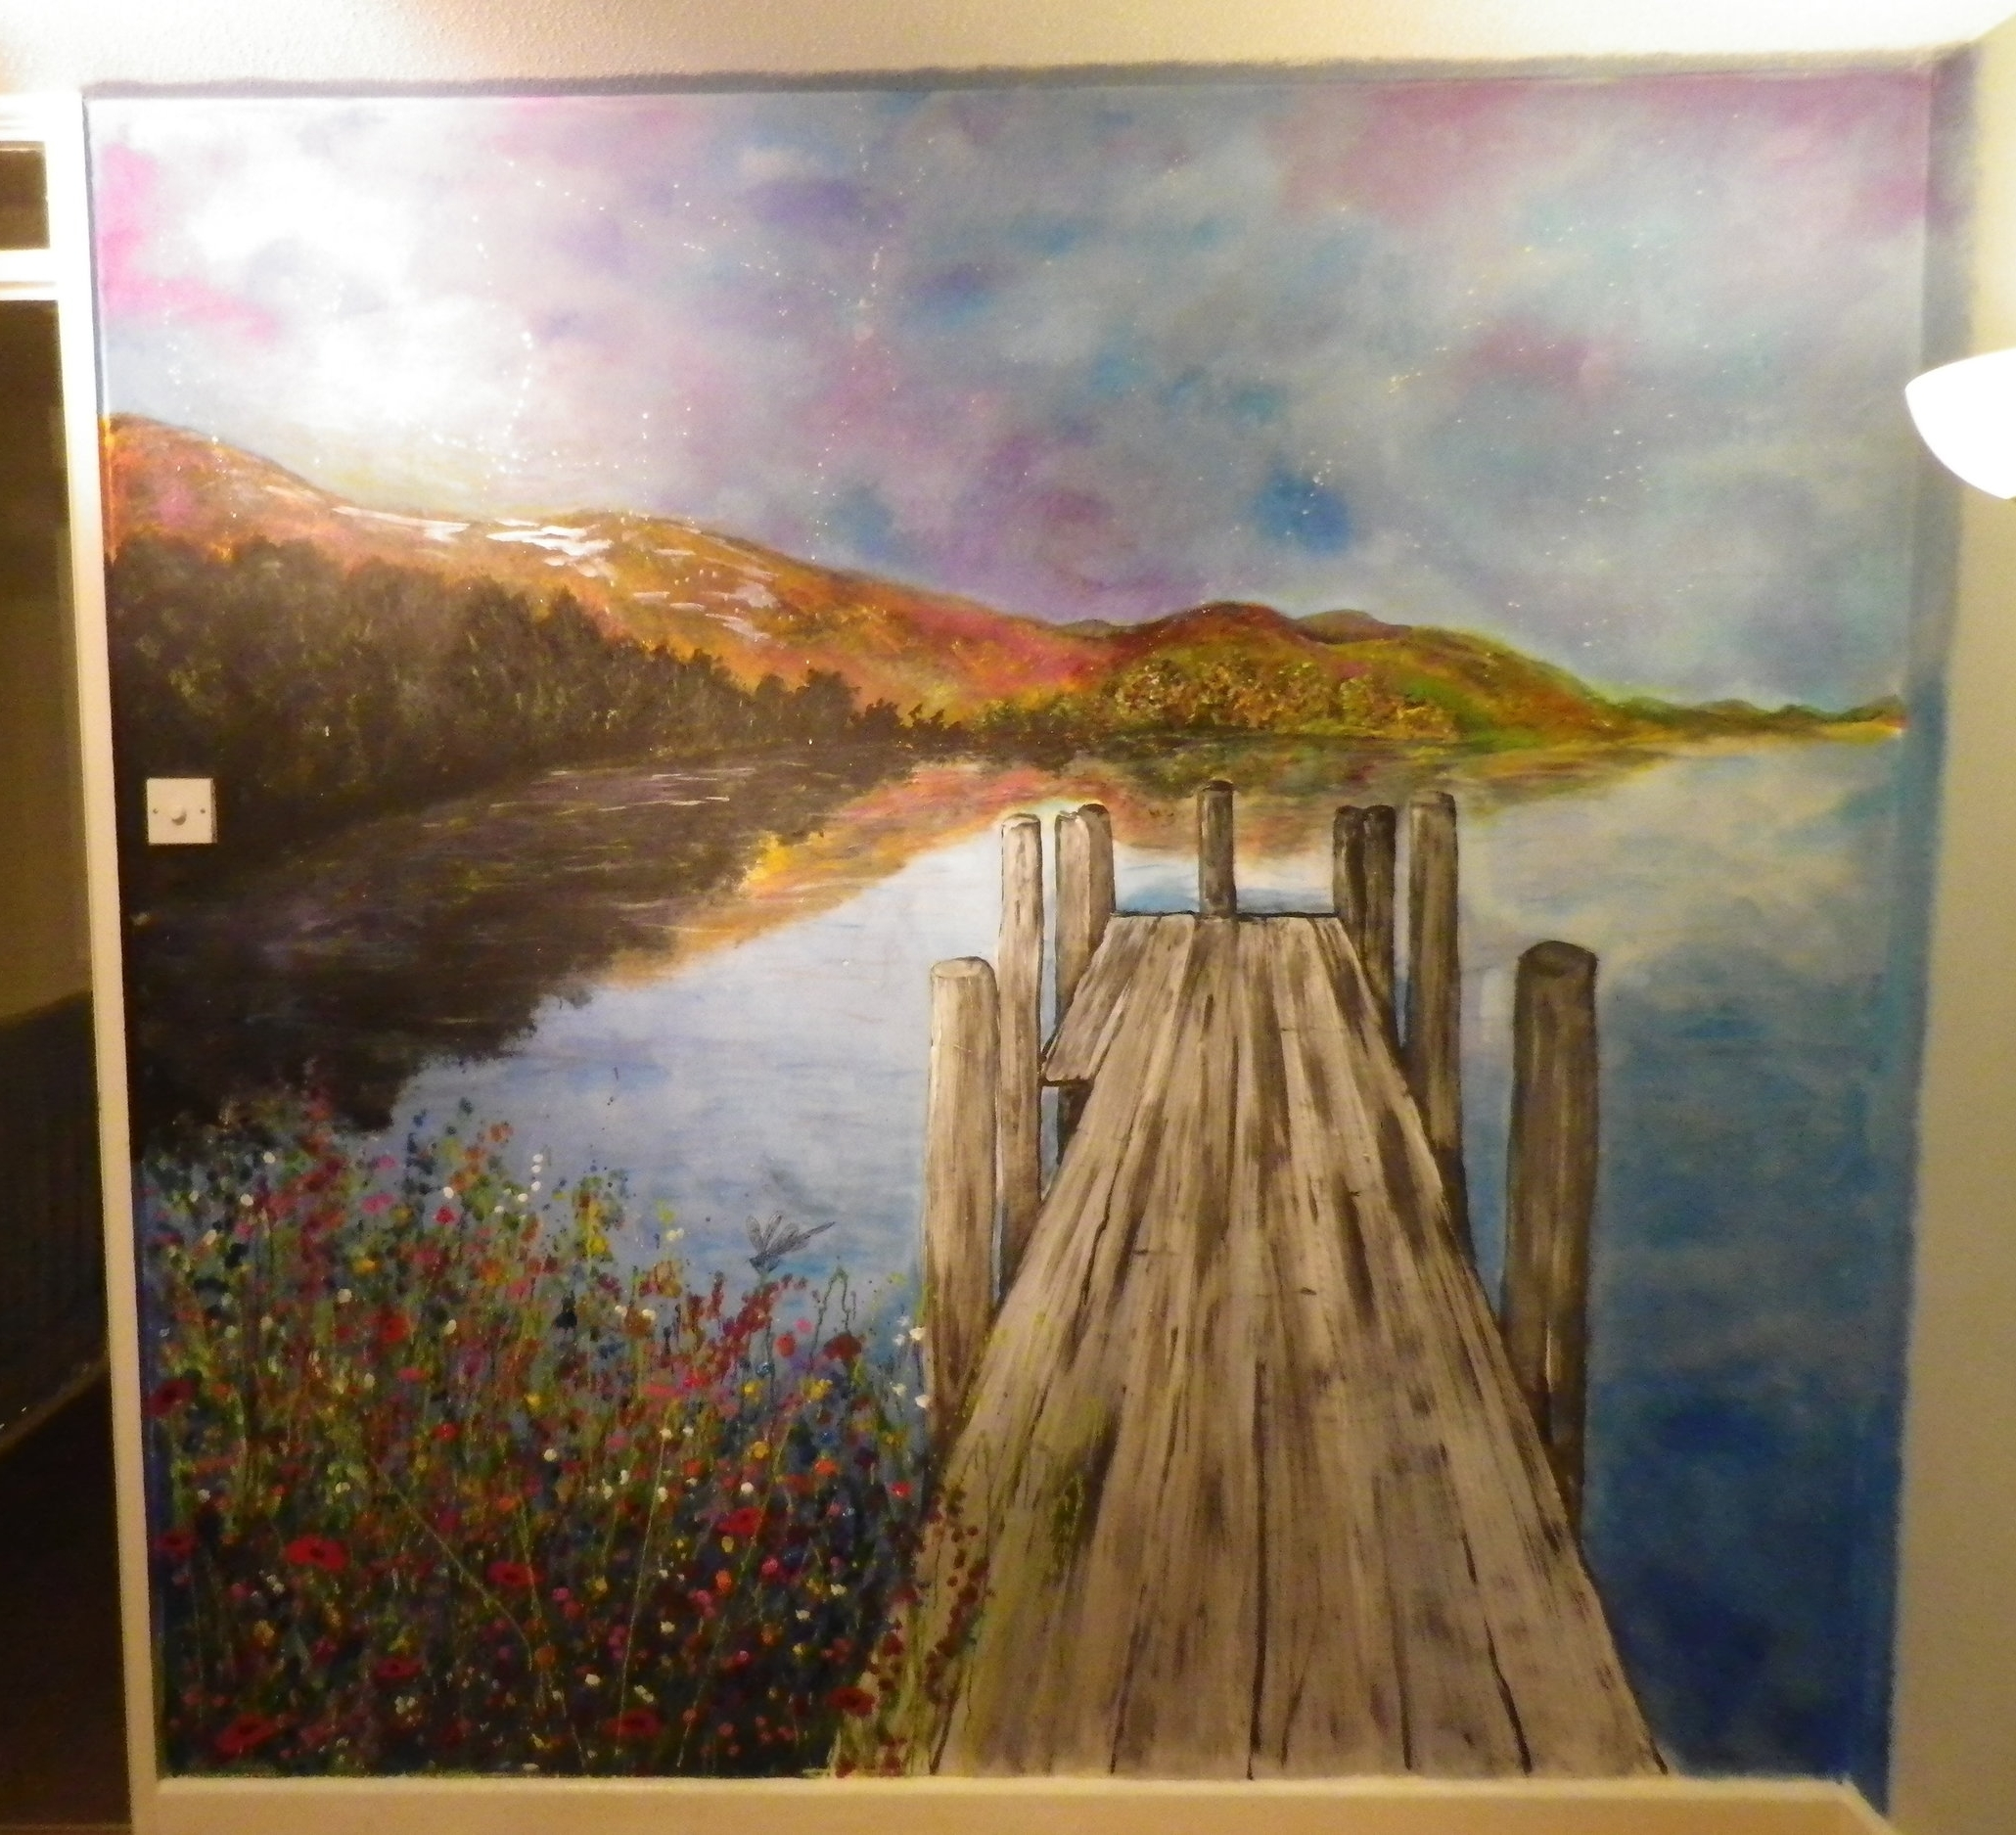 Lake scene wall mural